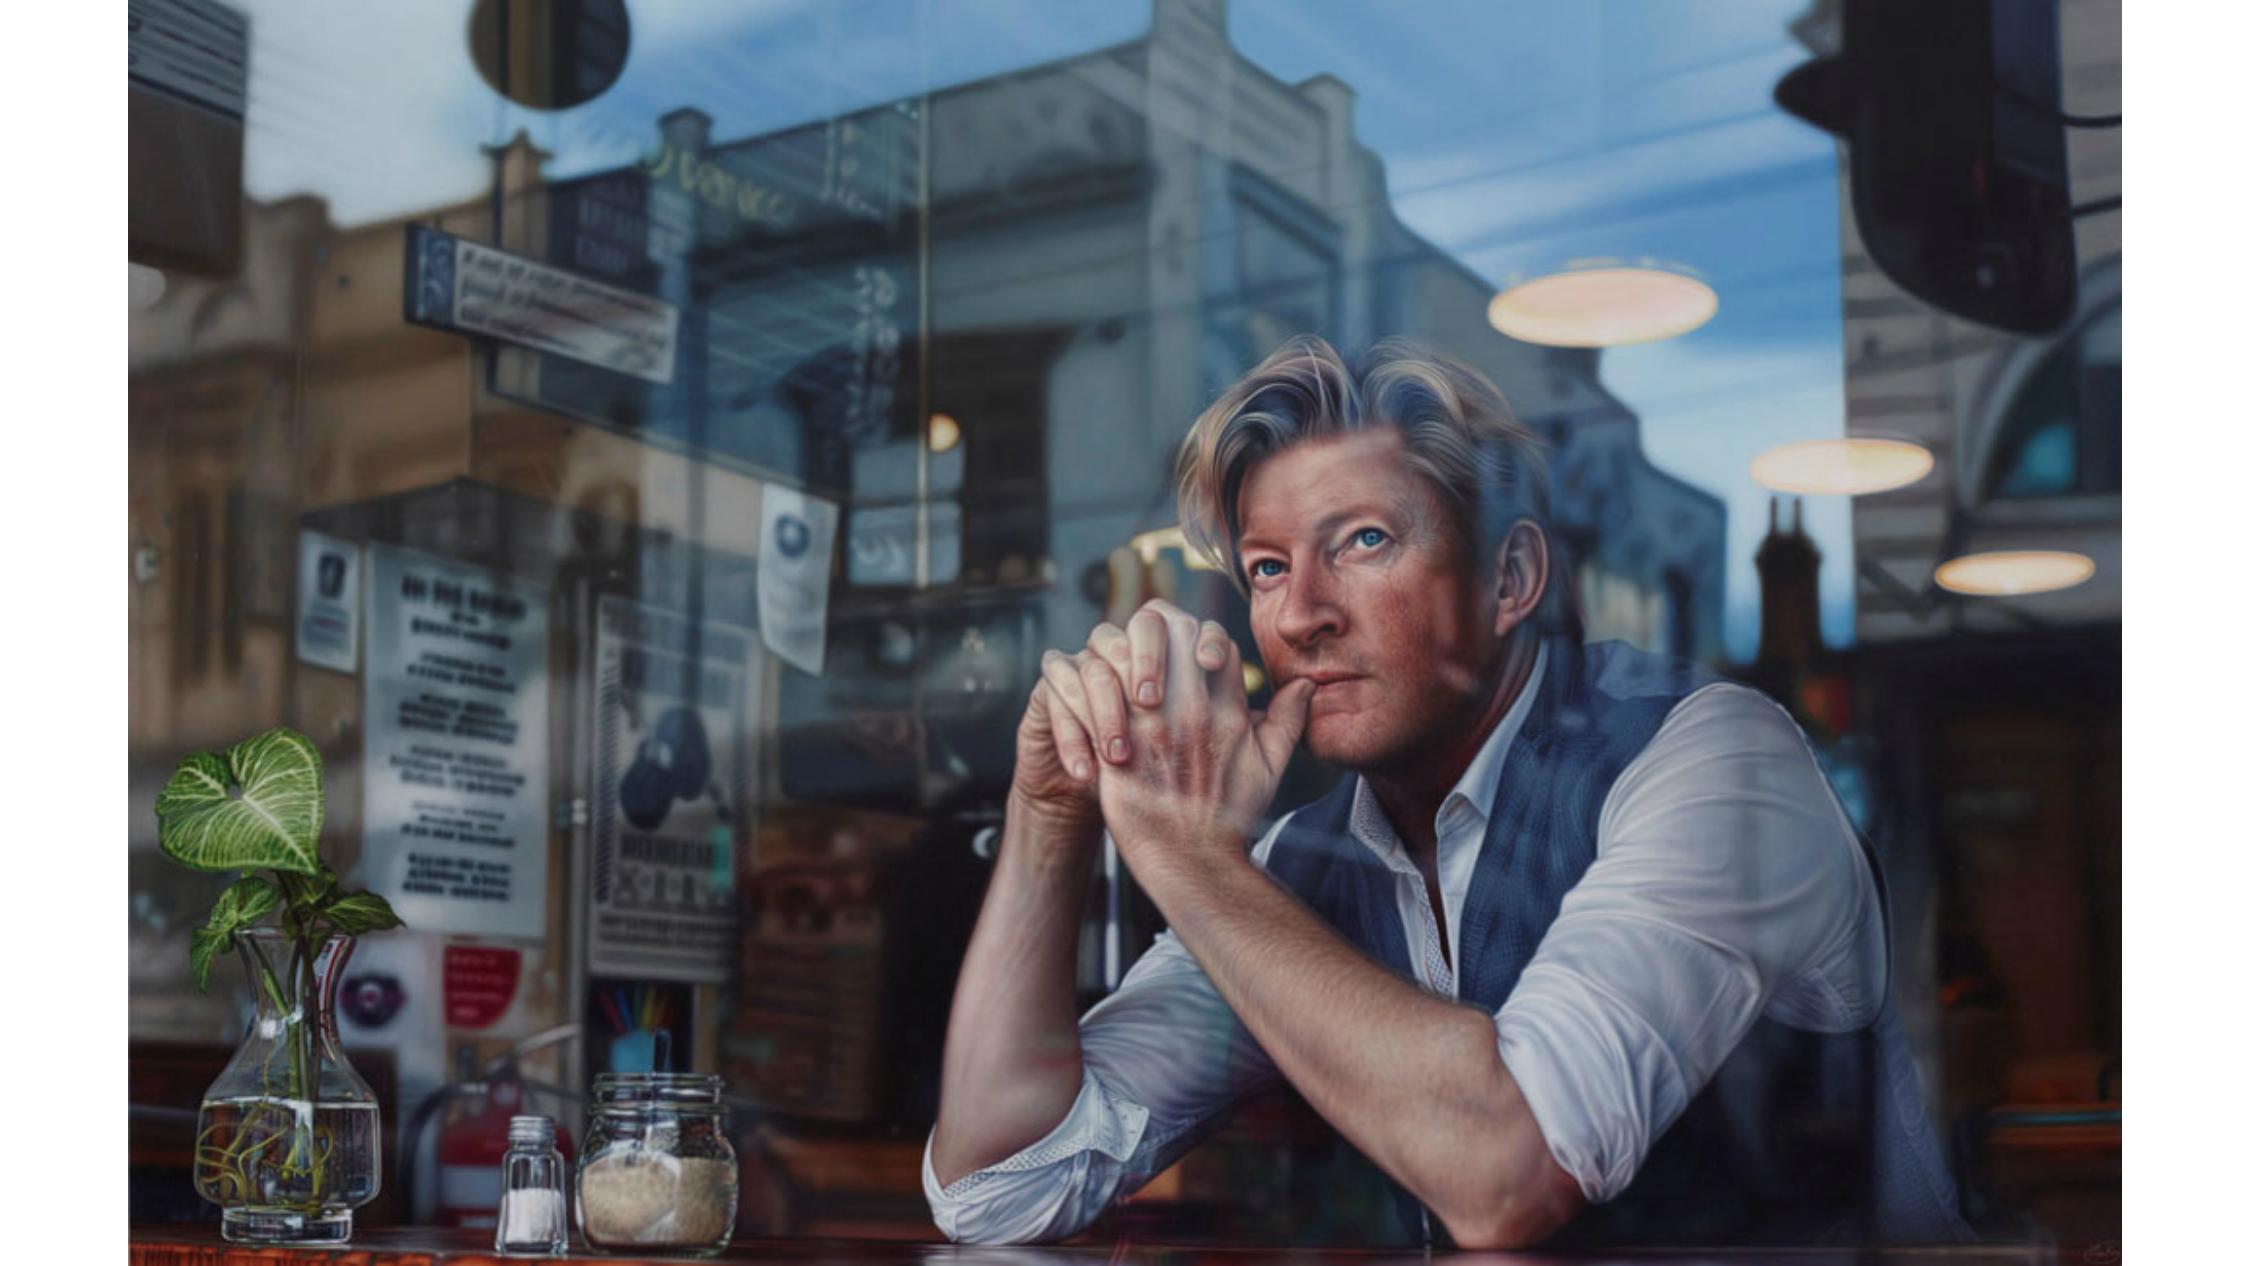 (Tessa MacKay, 'Through the looking glass')